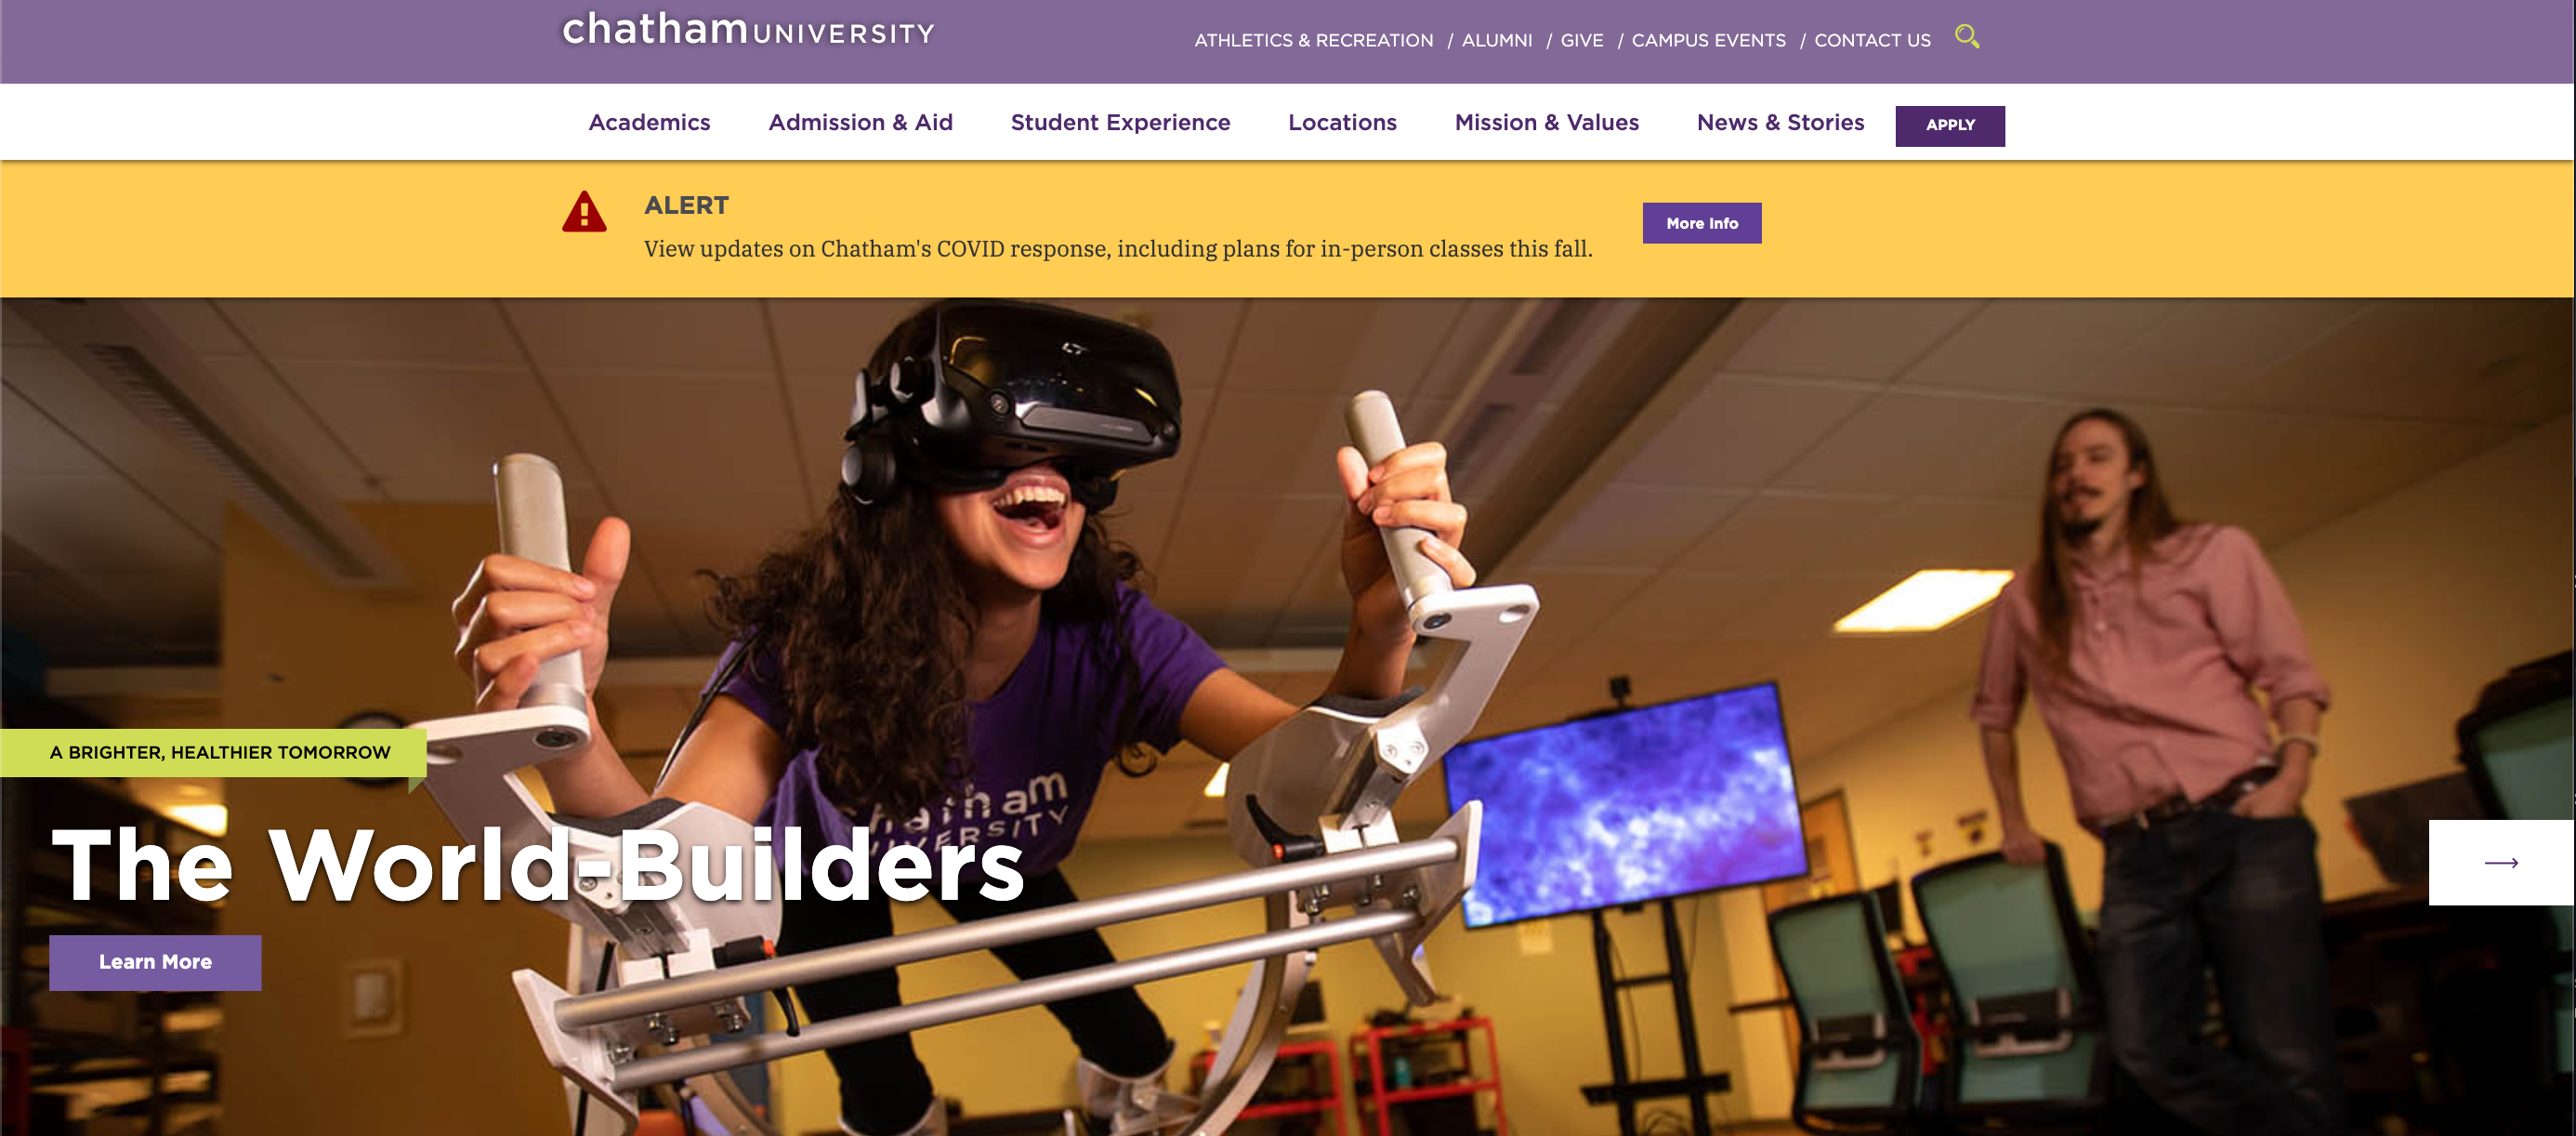 chatham university homepage banner